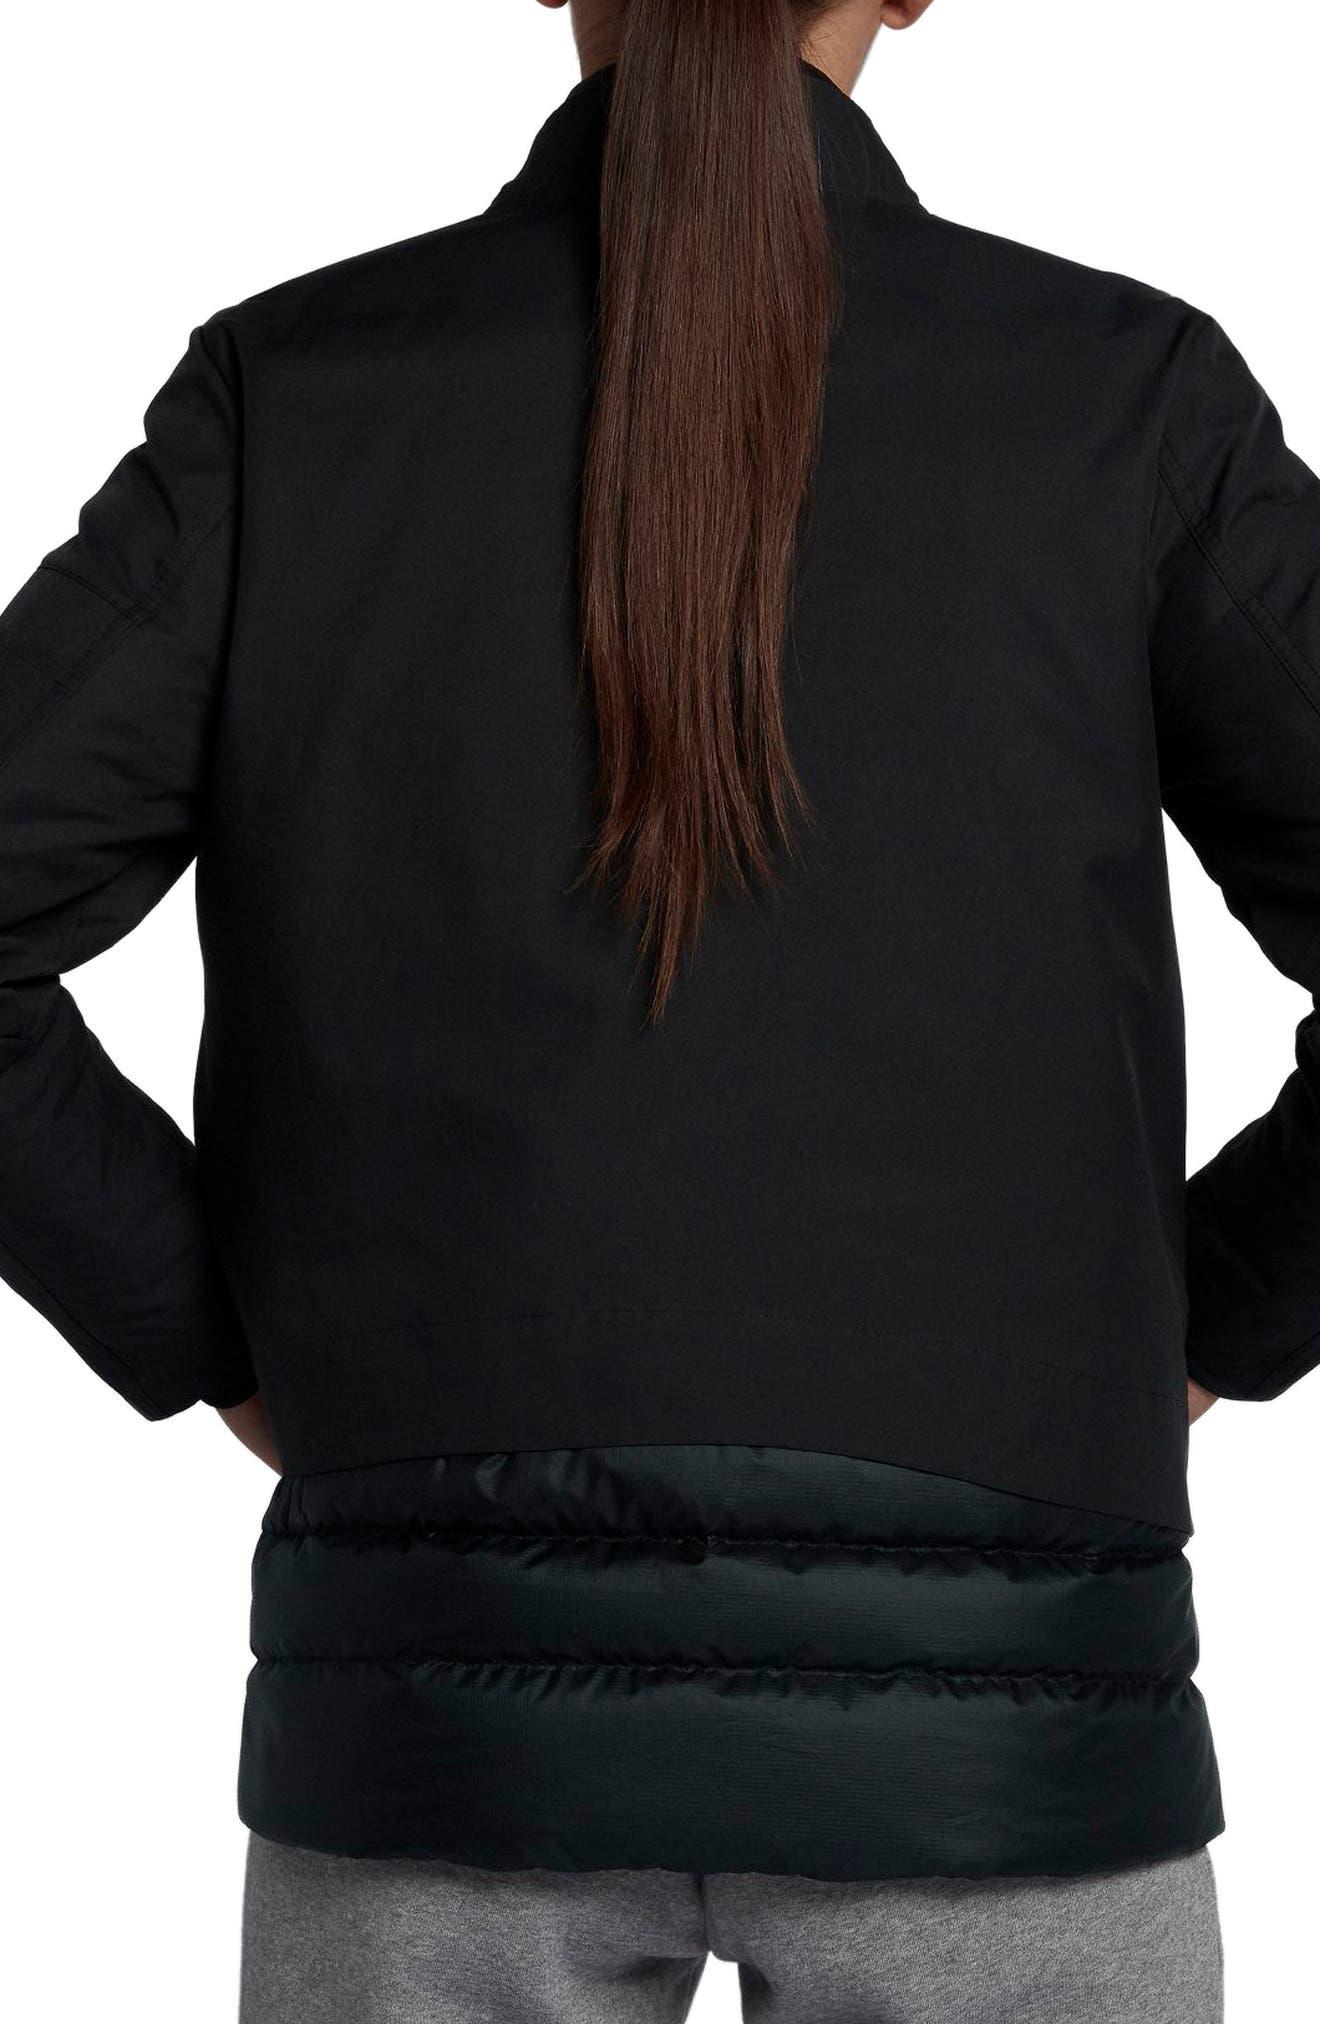 Sportswear AeroLoft 3-in-1 Down Jacket,                             Alternate thumbnail 4, color,                             Black/ Black/ Black